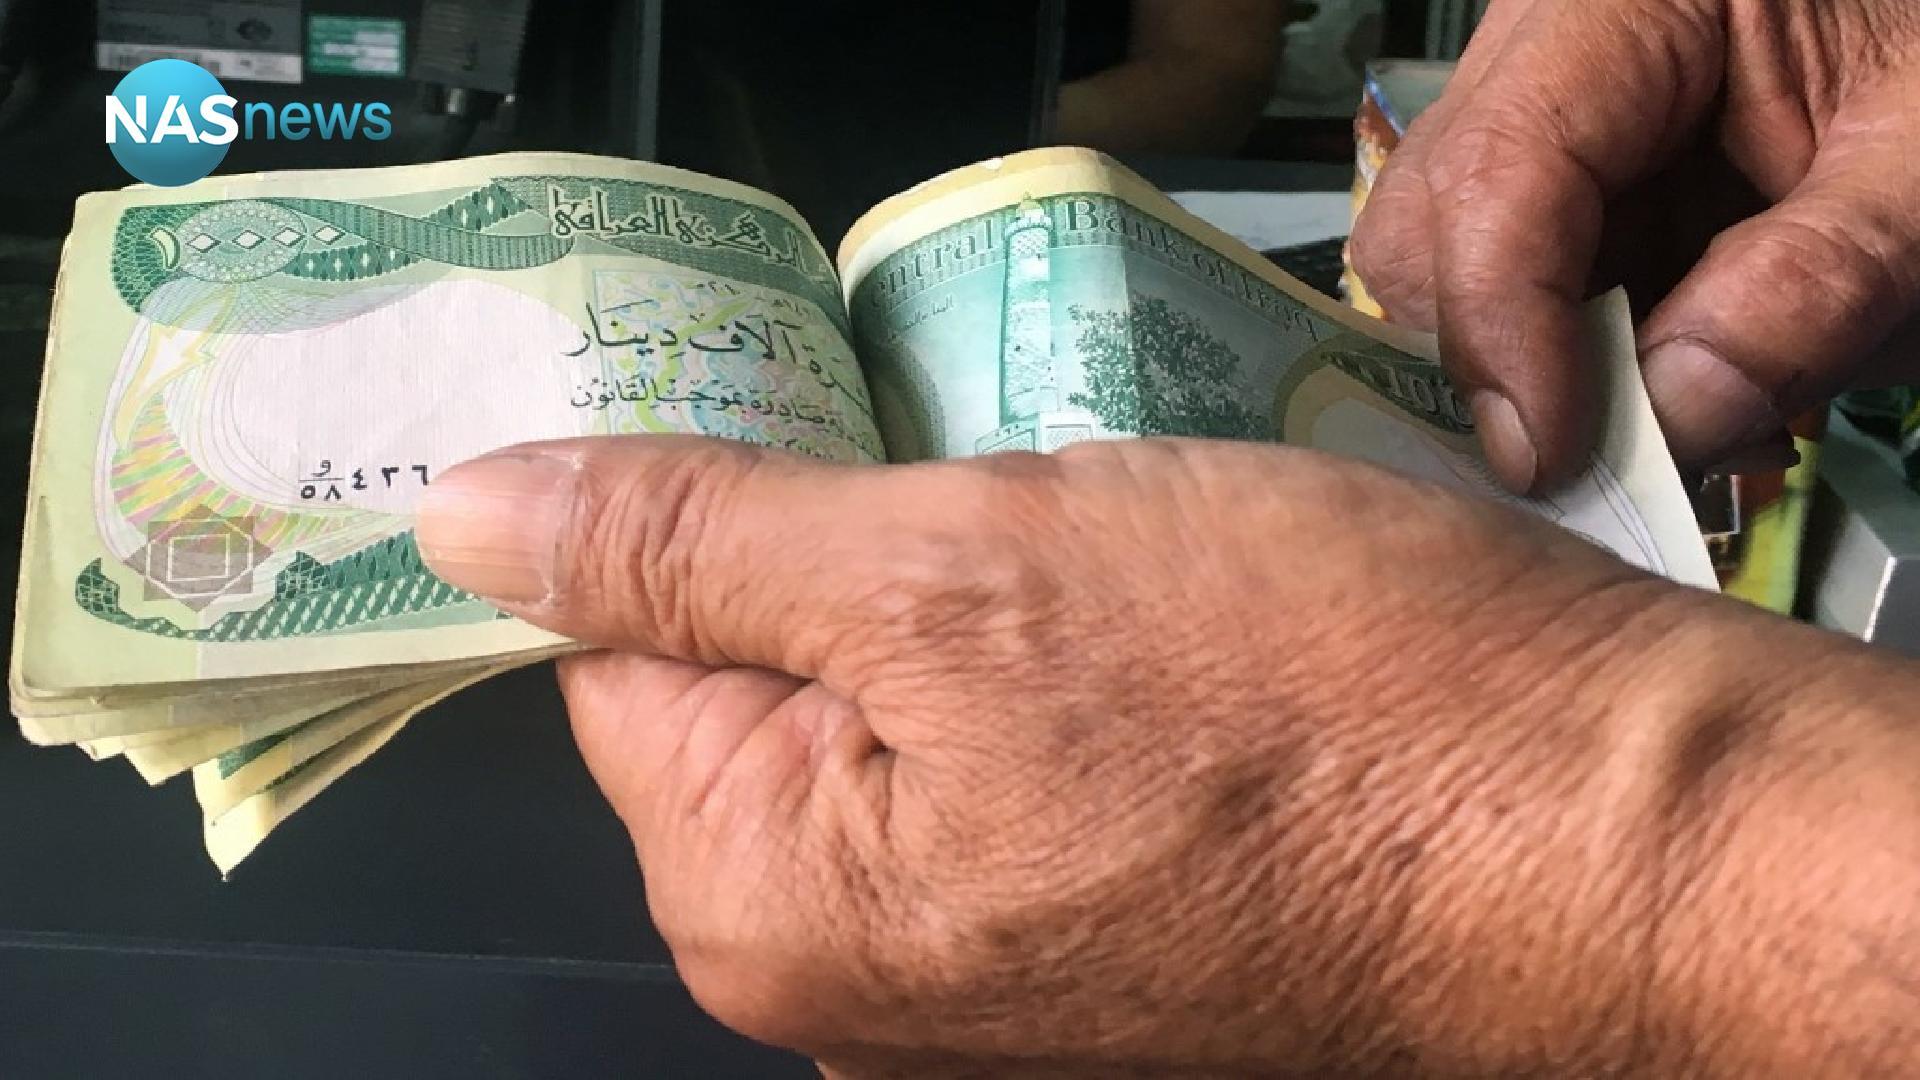 Al-Rafidain Bank announces the increase in interest on deposits - rewarding financial returns